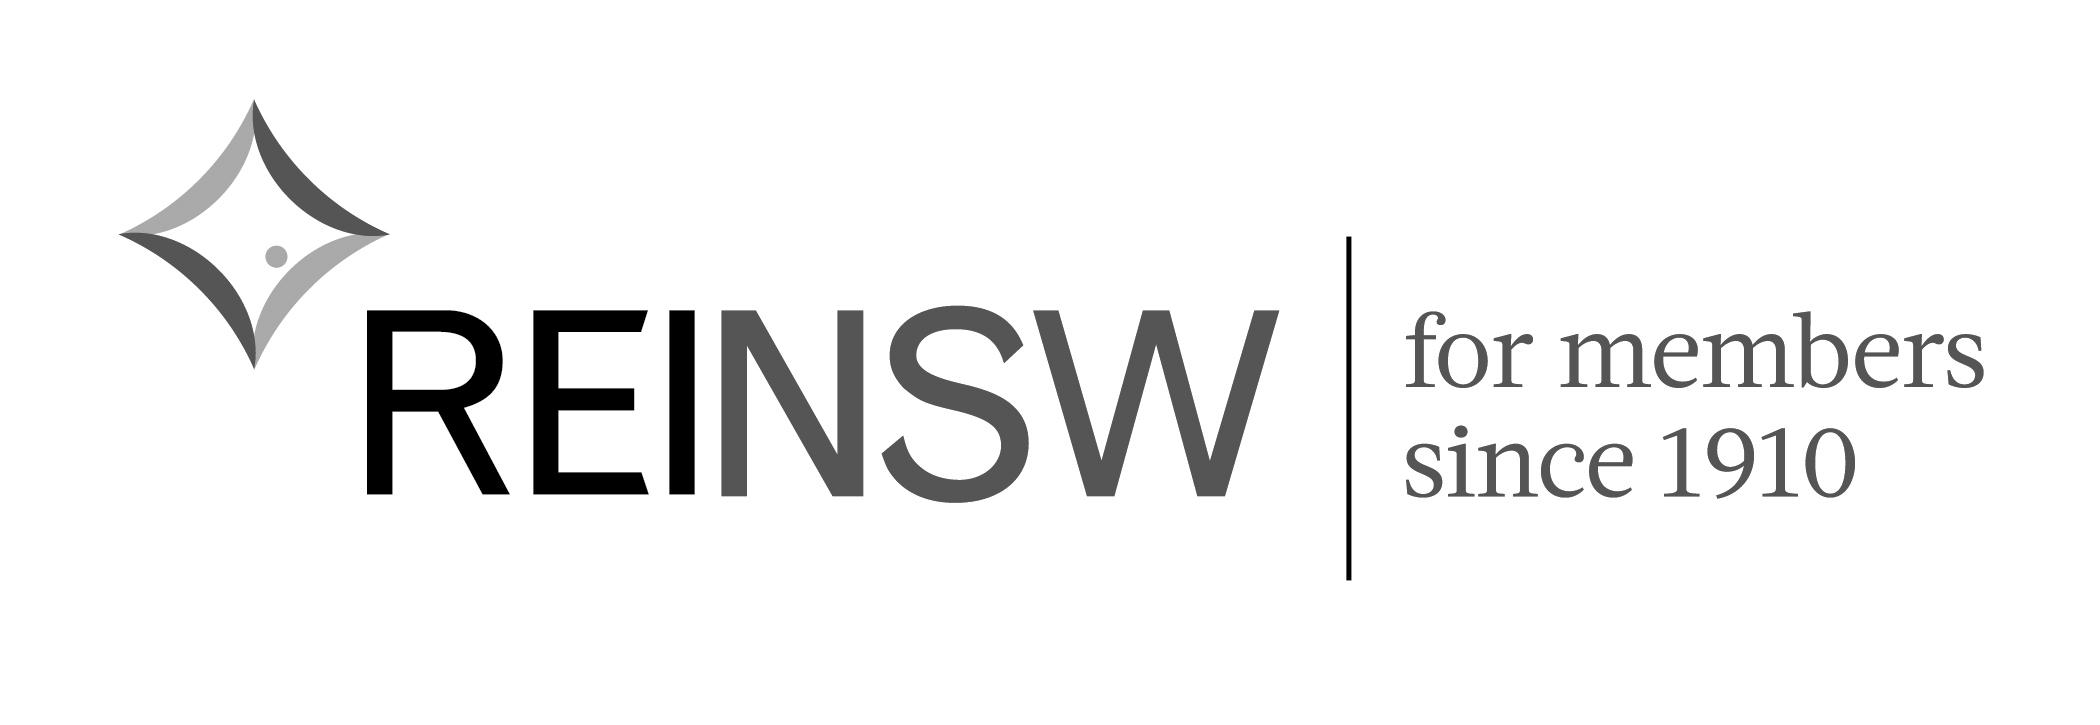 REINSW 2012 Logo HOR_COL.jpg